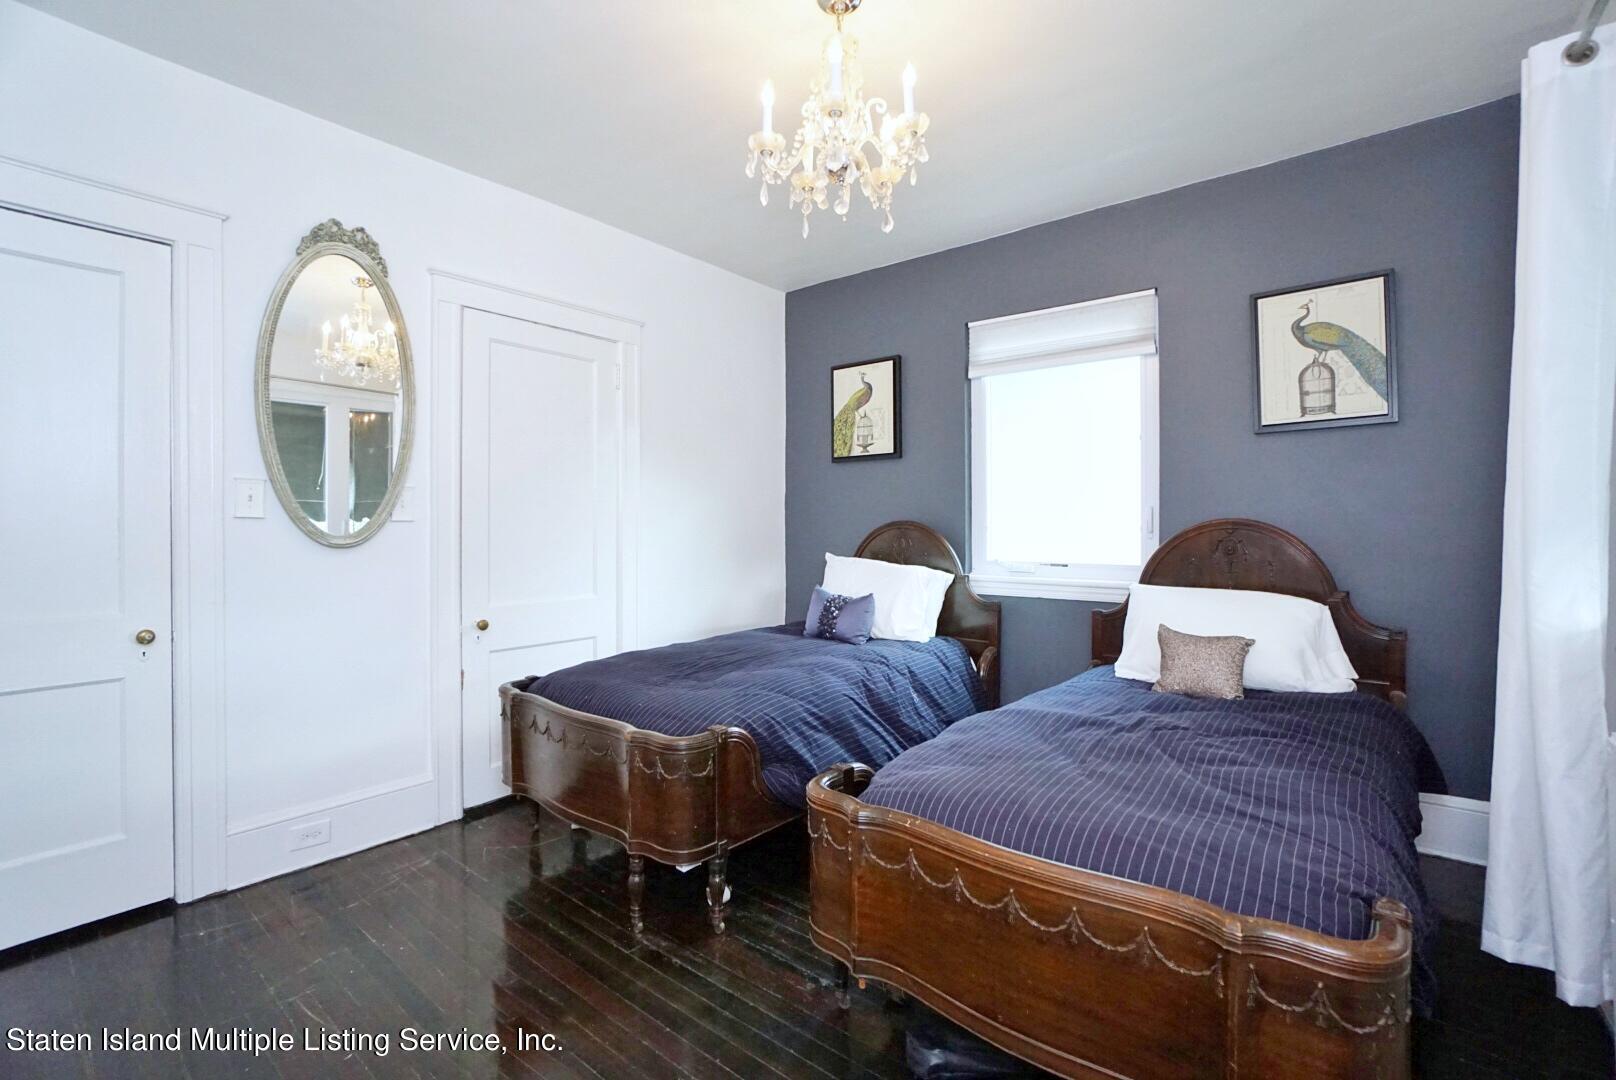 Single Family - Detached 311 Bement Avenue  Staten Island, NY 10310, MLS-1147133-24